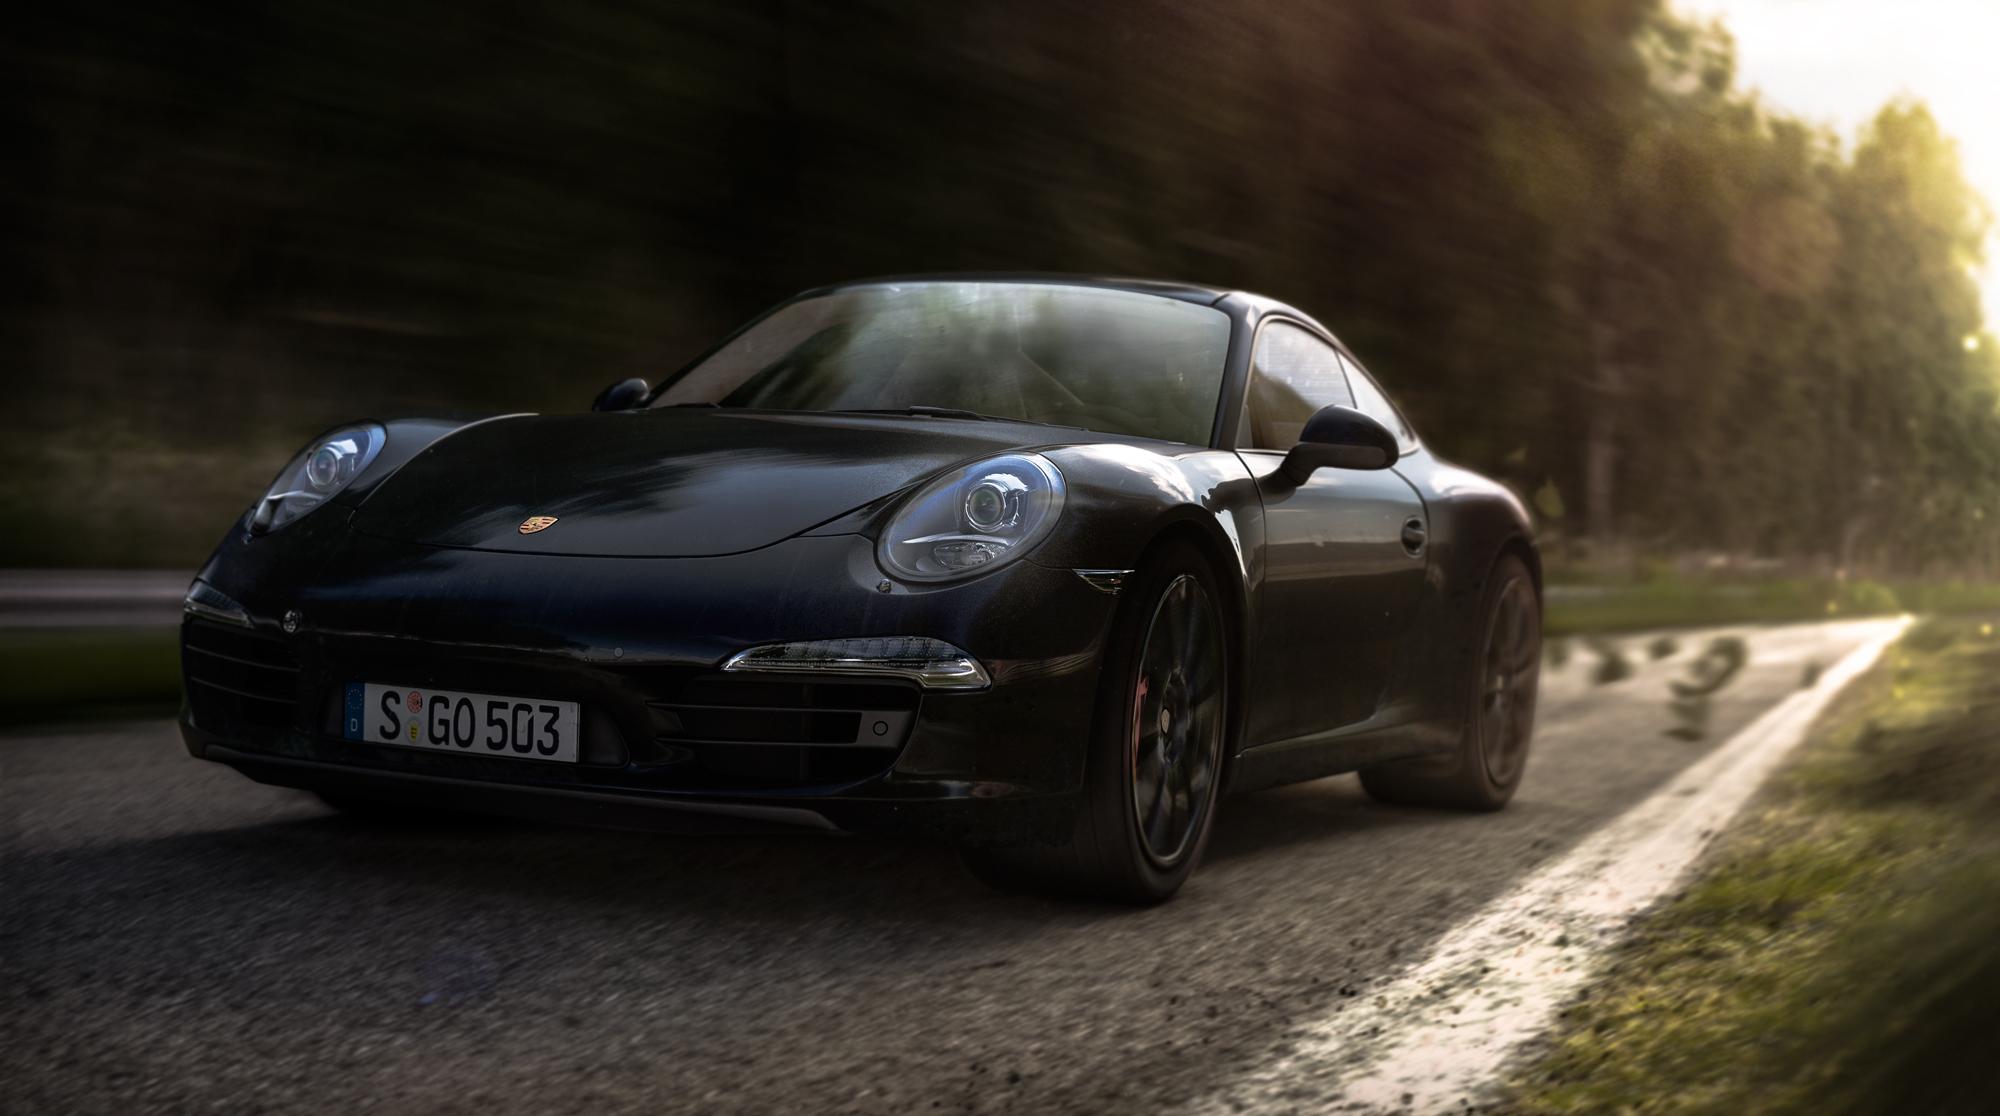 Porsche Carrera S - Black